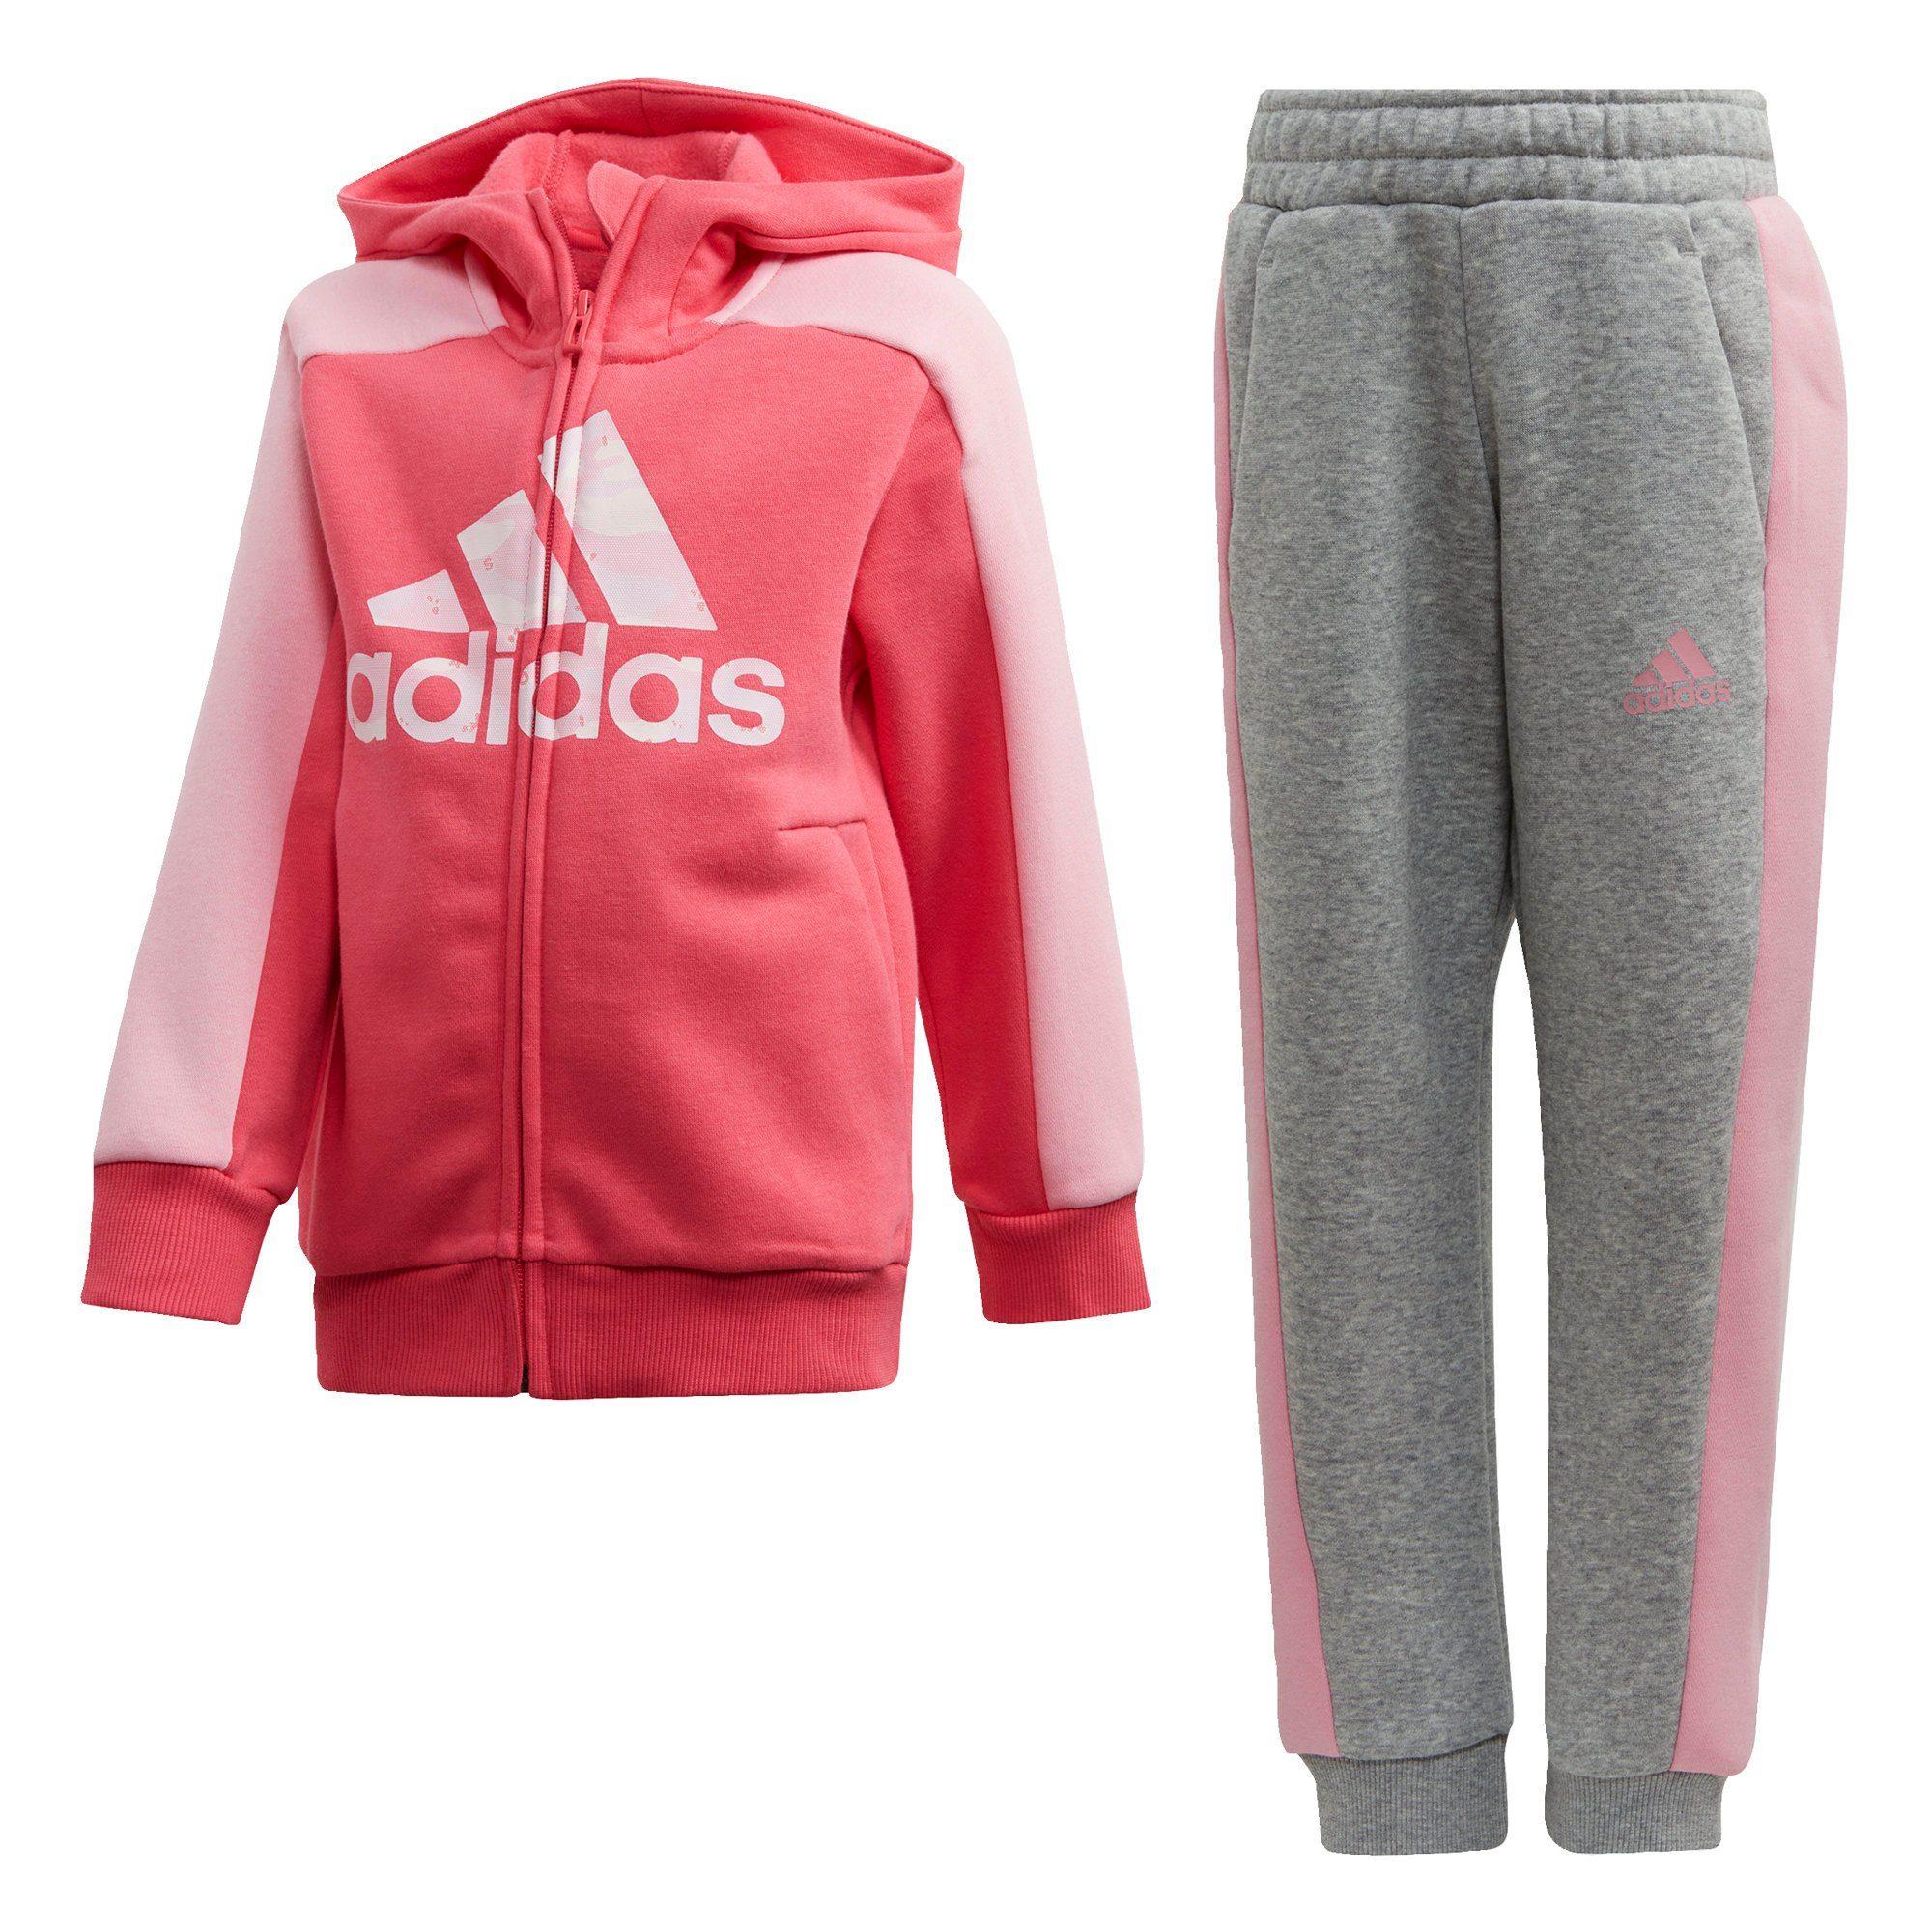 adidas kinder jogginganzug 134